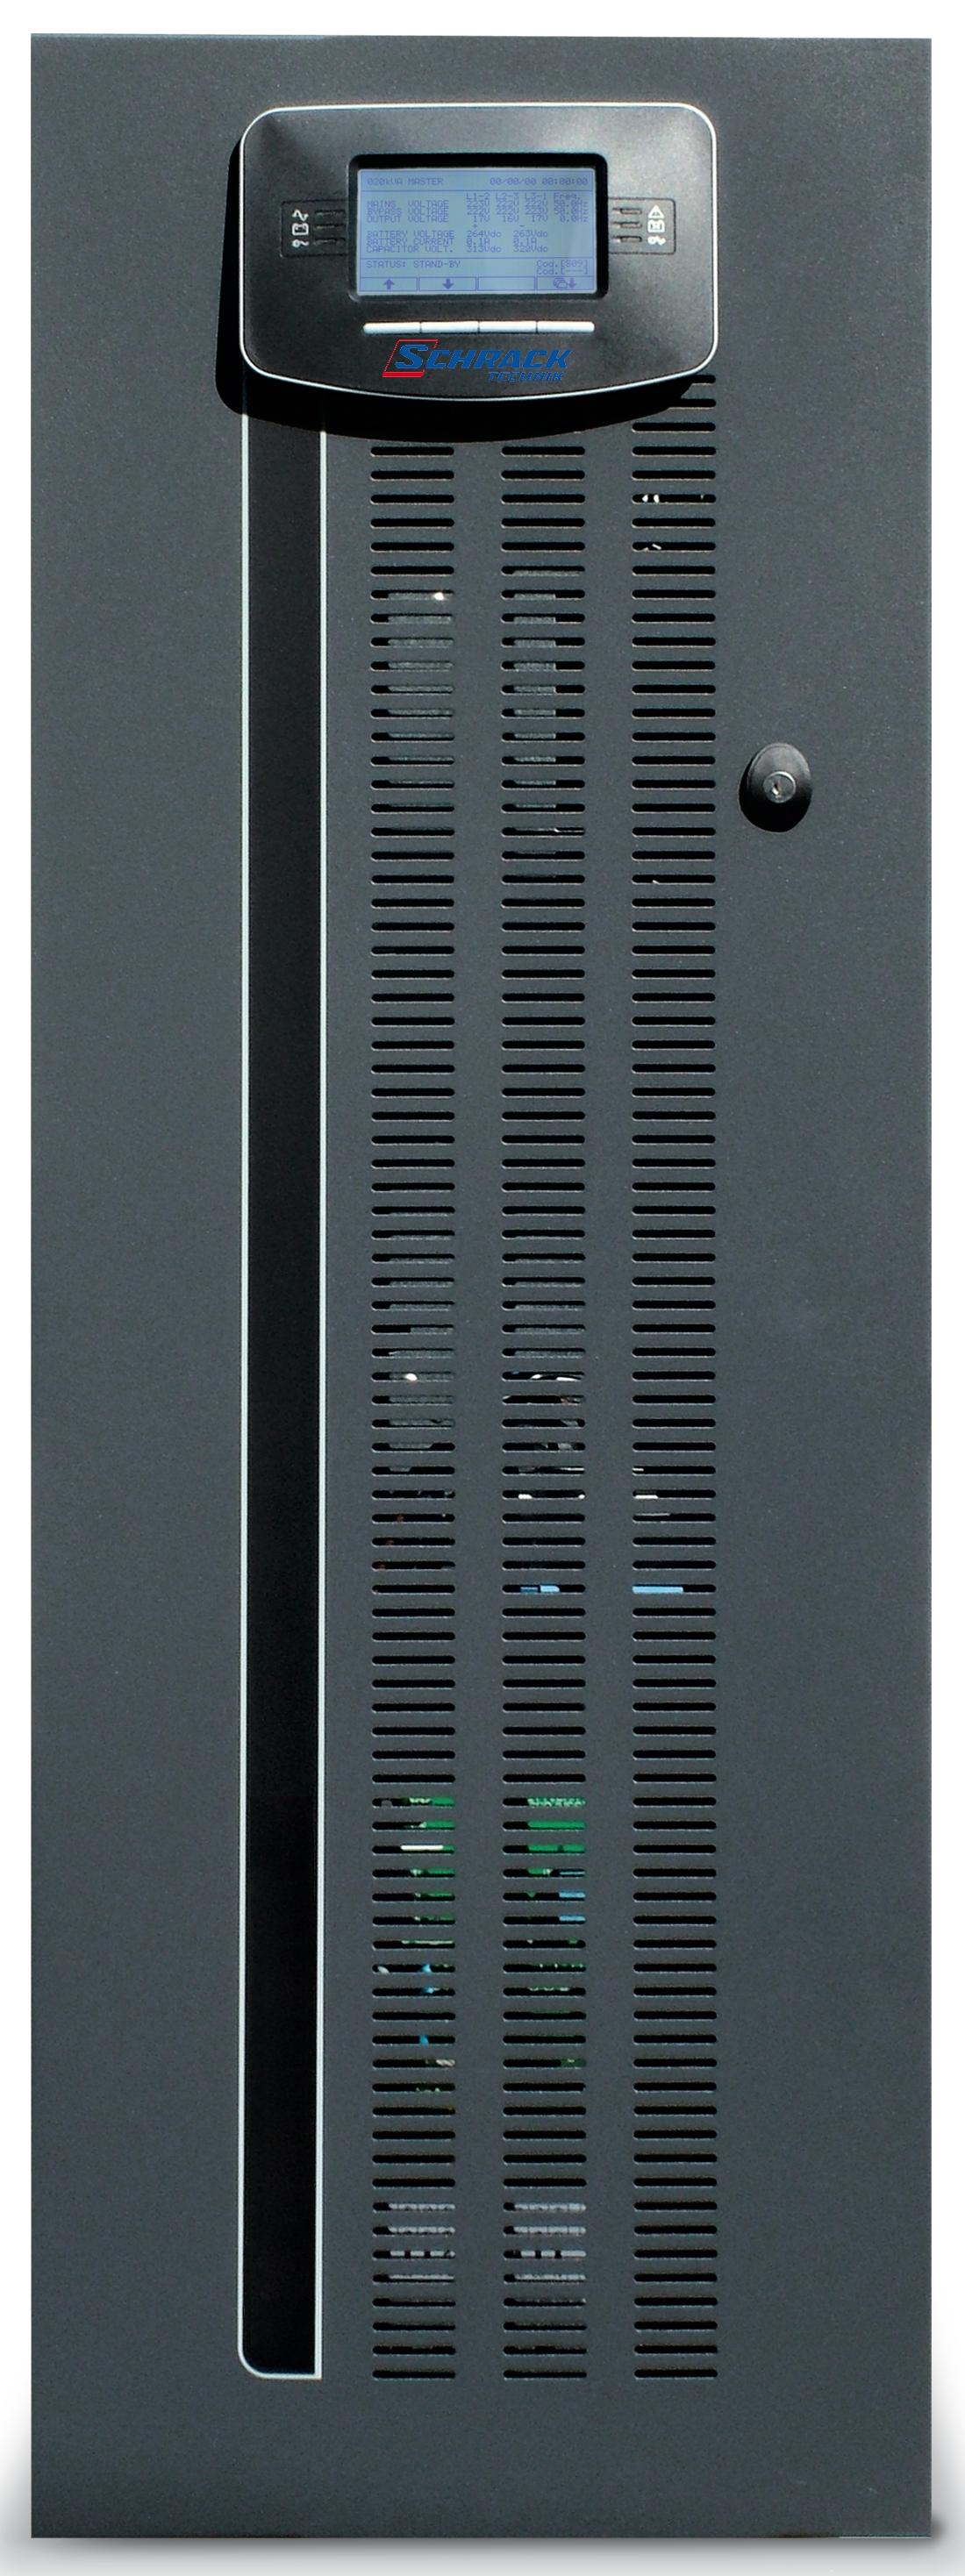 1 Stk USV AVARA Multi 12kVA 10,8kW 23Min.3ph/3ph /Online USMLT12XM1